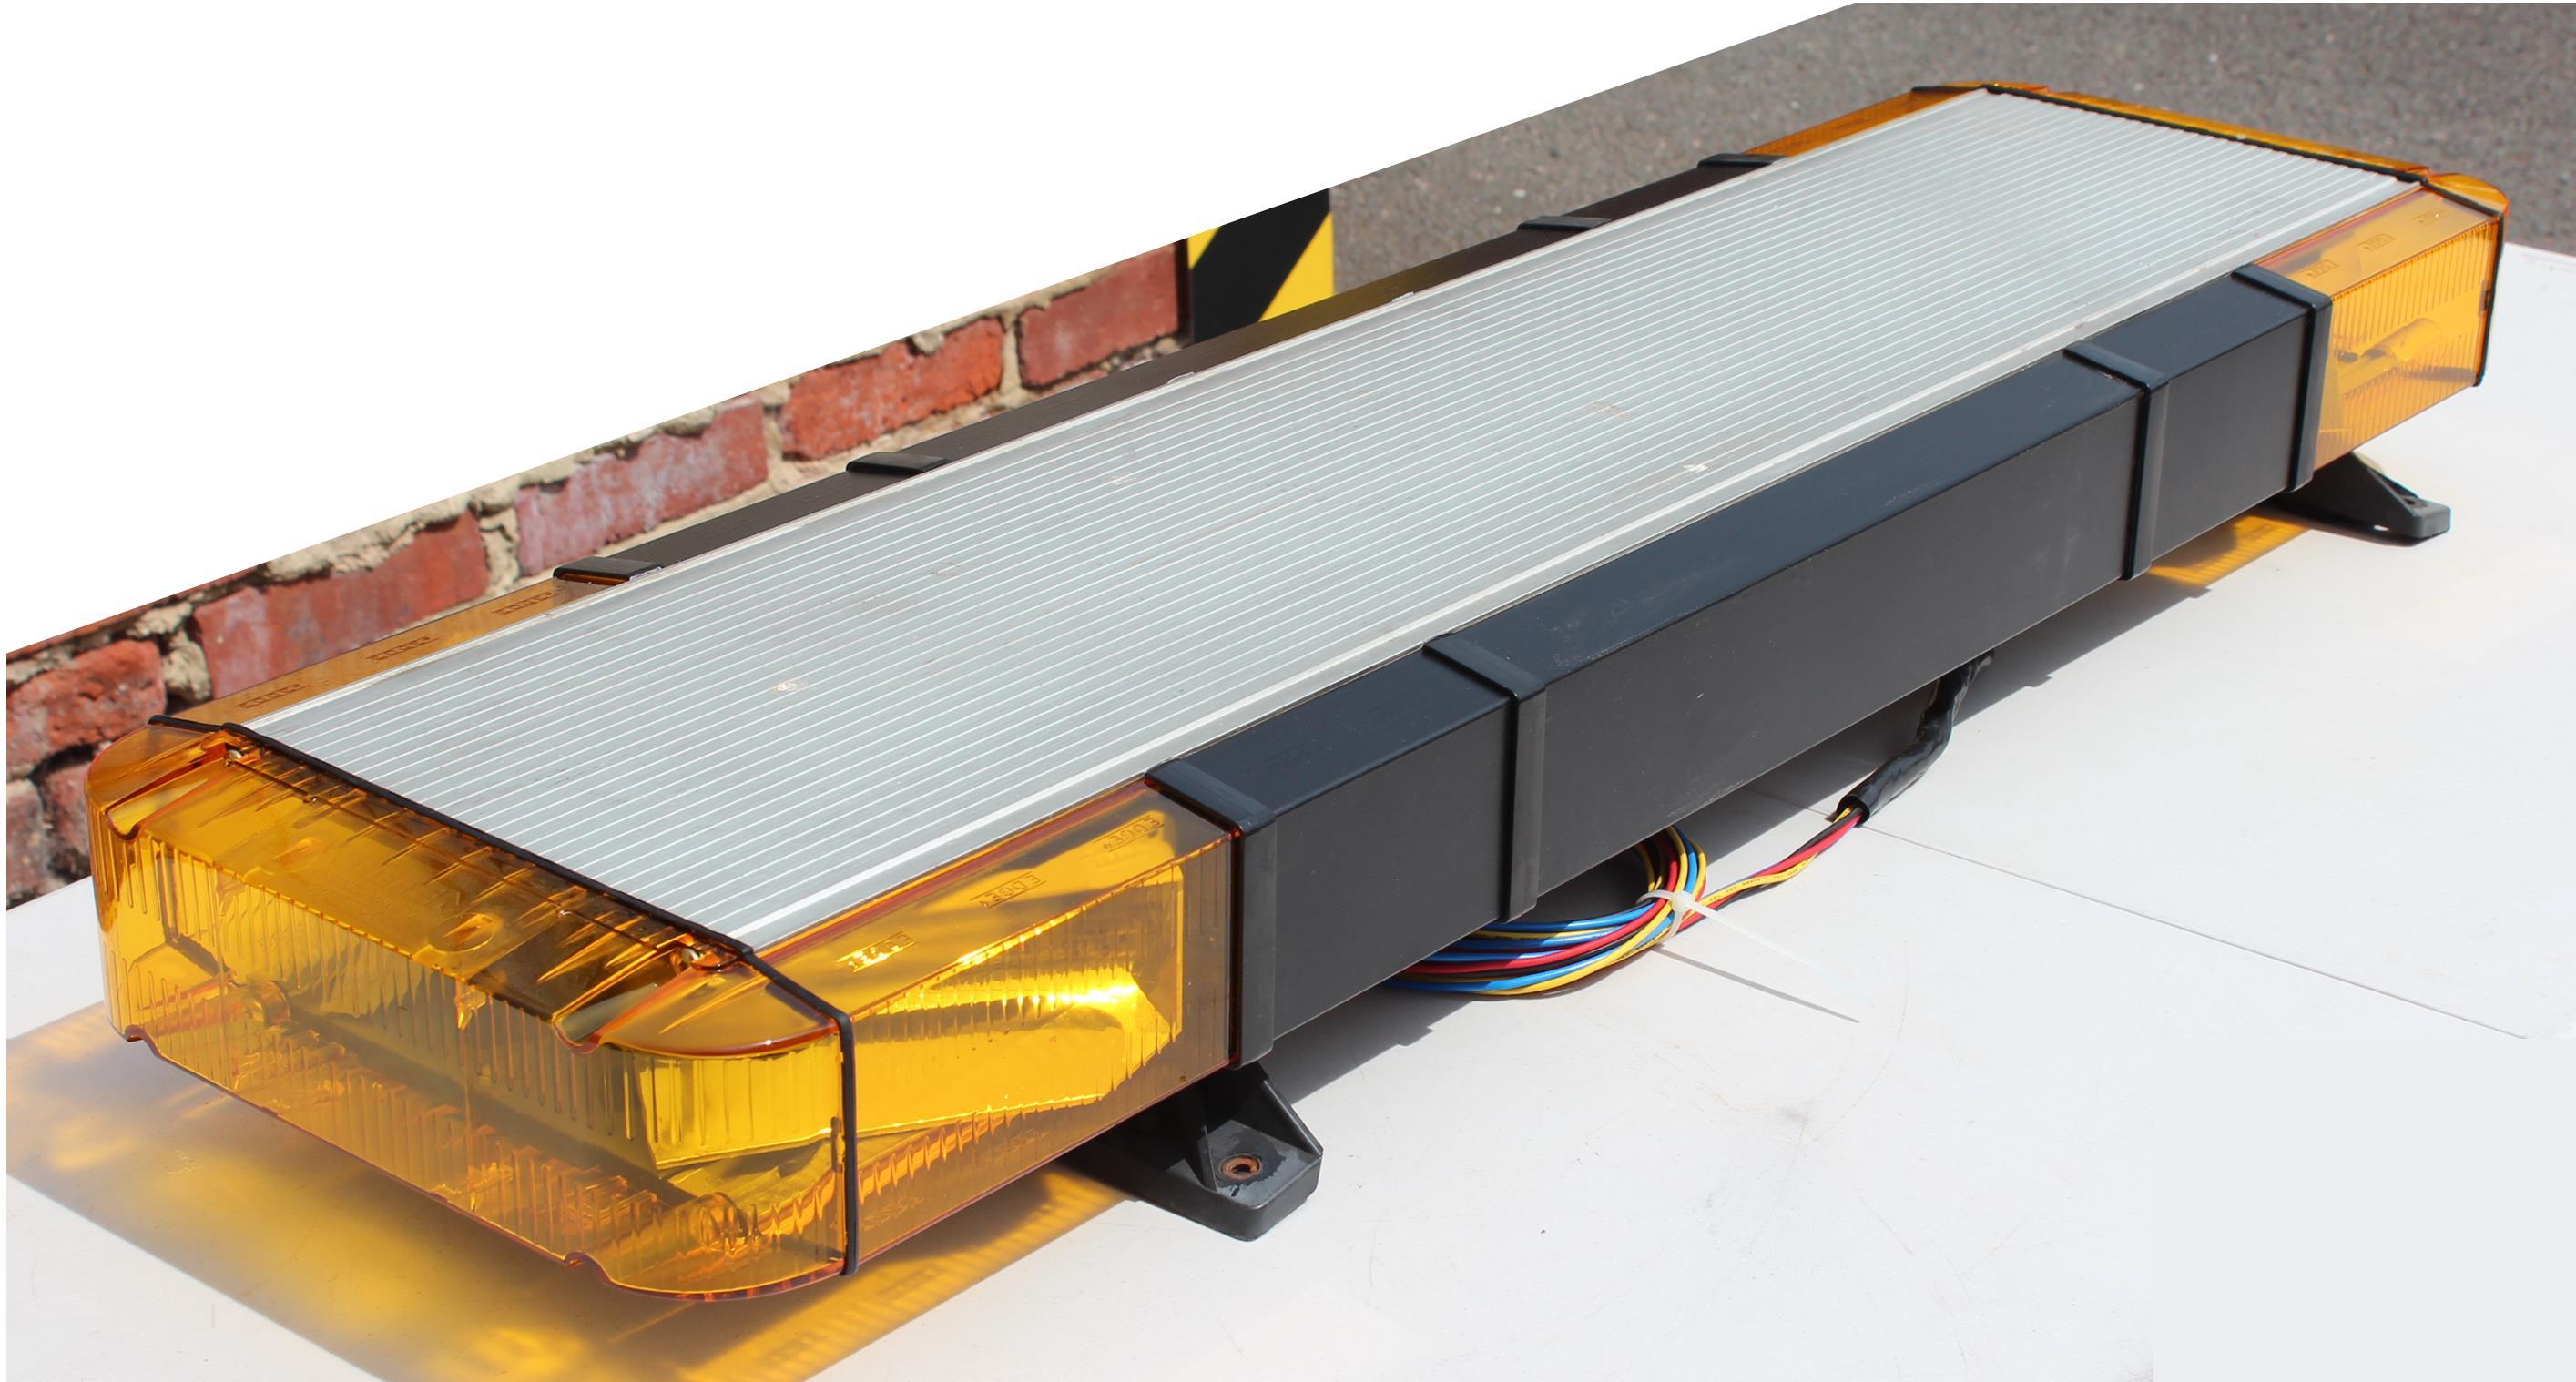 Edge01?maxwidth=950&maxheight=600 whelen edge ultra lightbar whelen freedom lightbar wiring diagram at bakdesigns.co